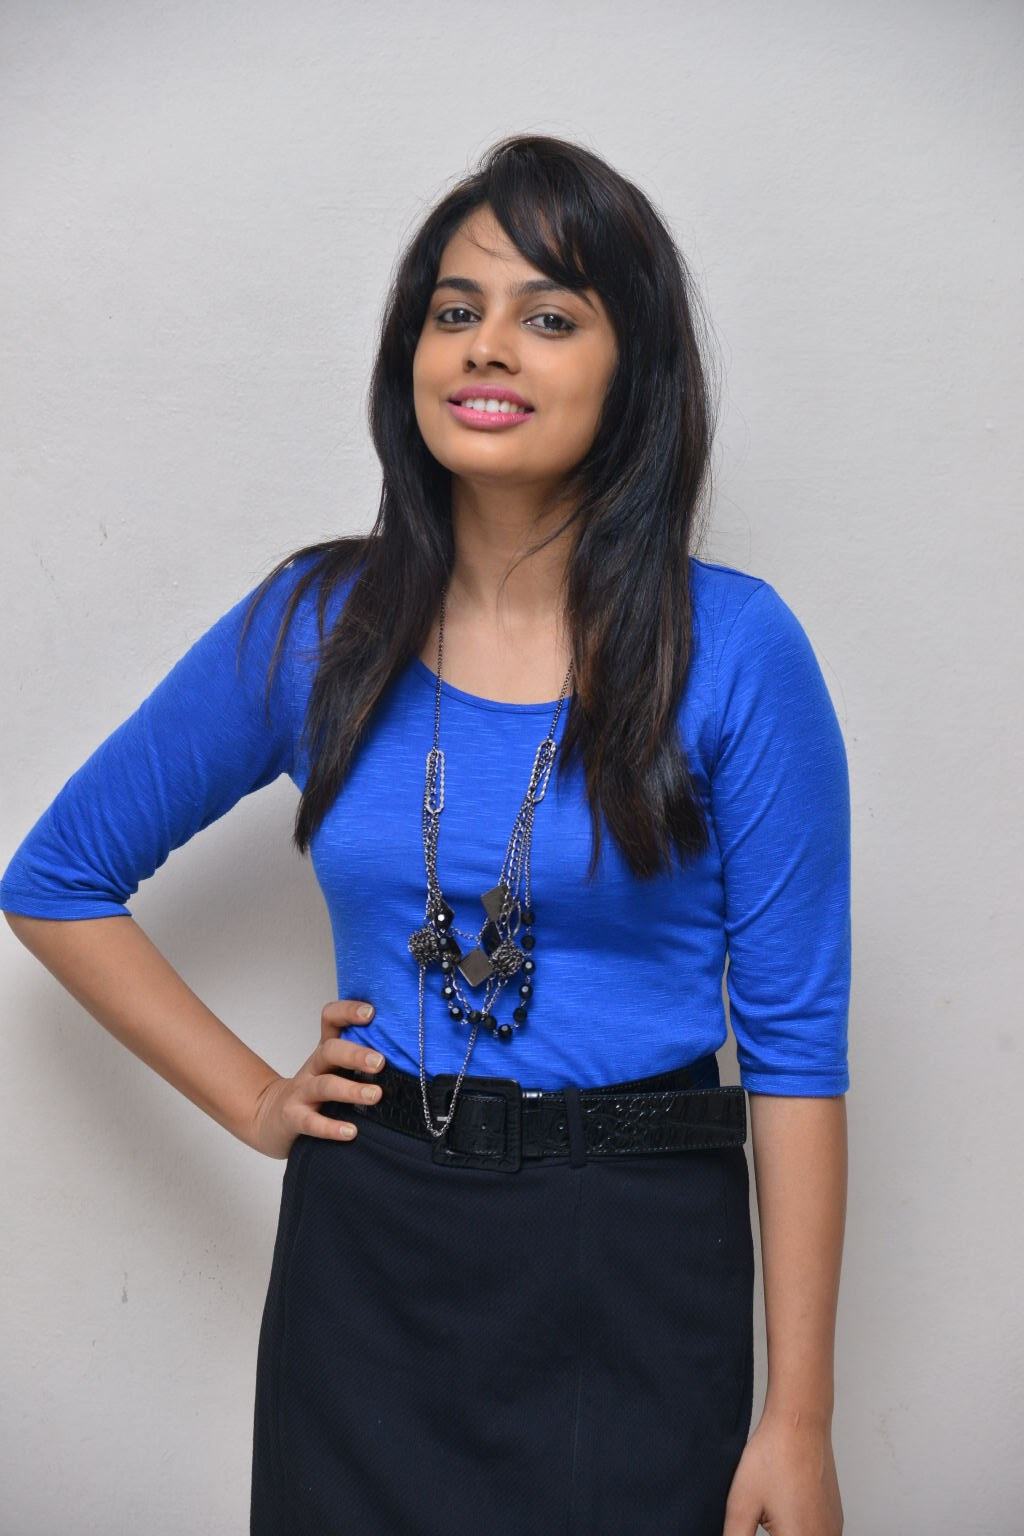 Nandita swtha sizzling in blue top-HQ-Photo-5